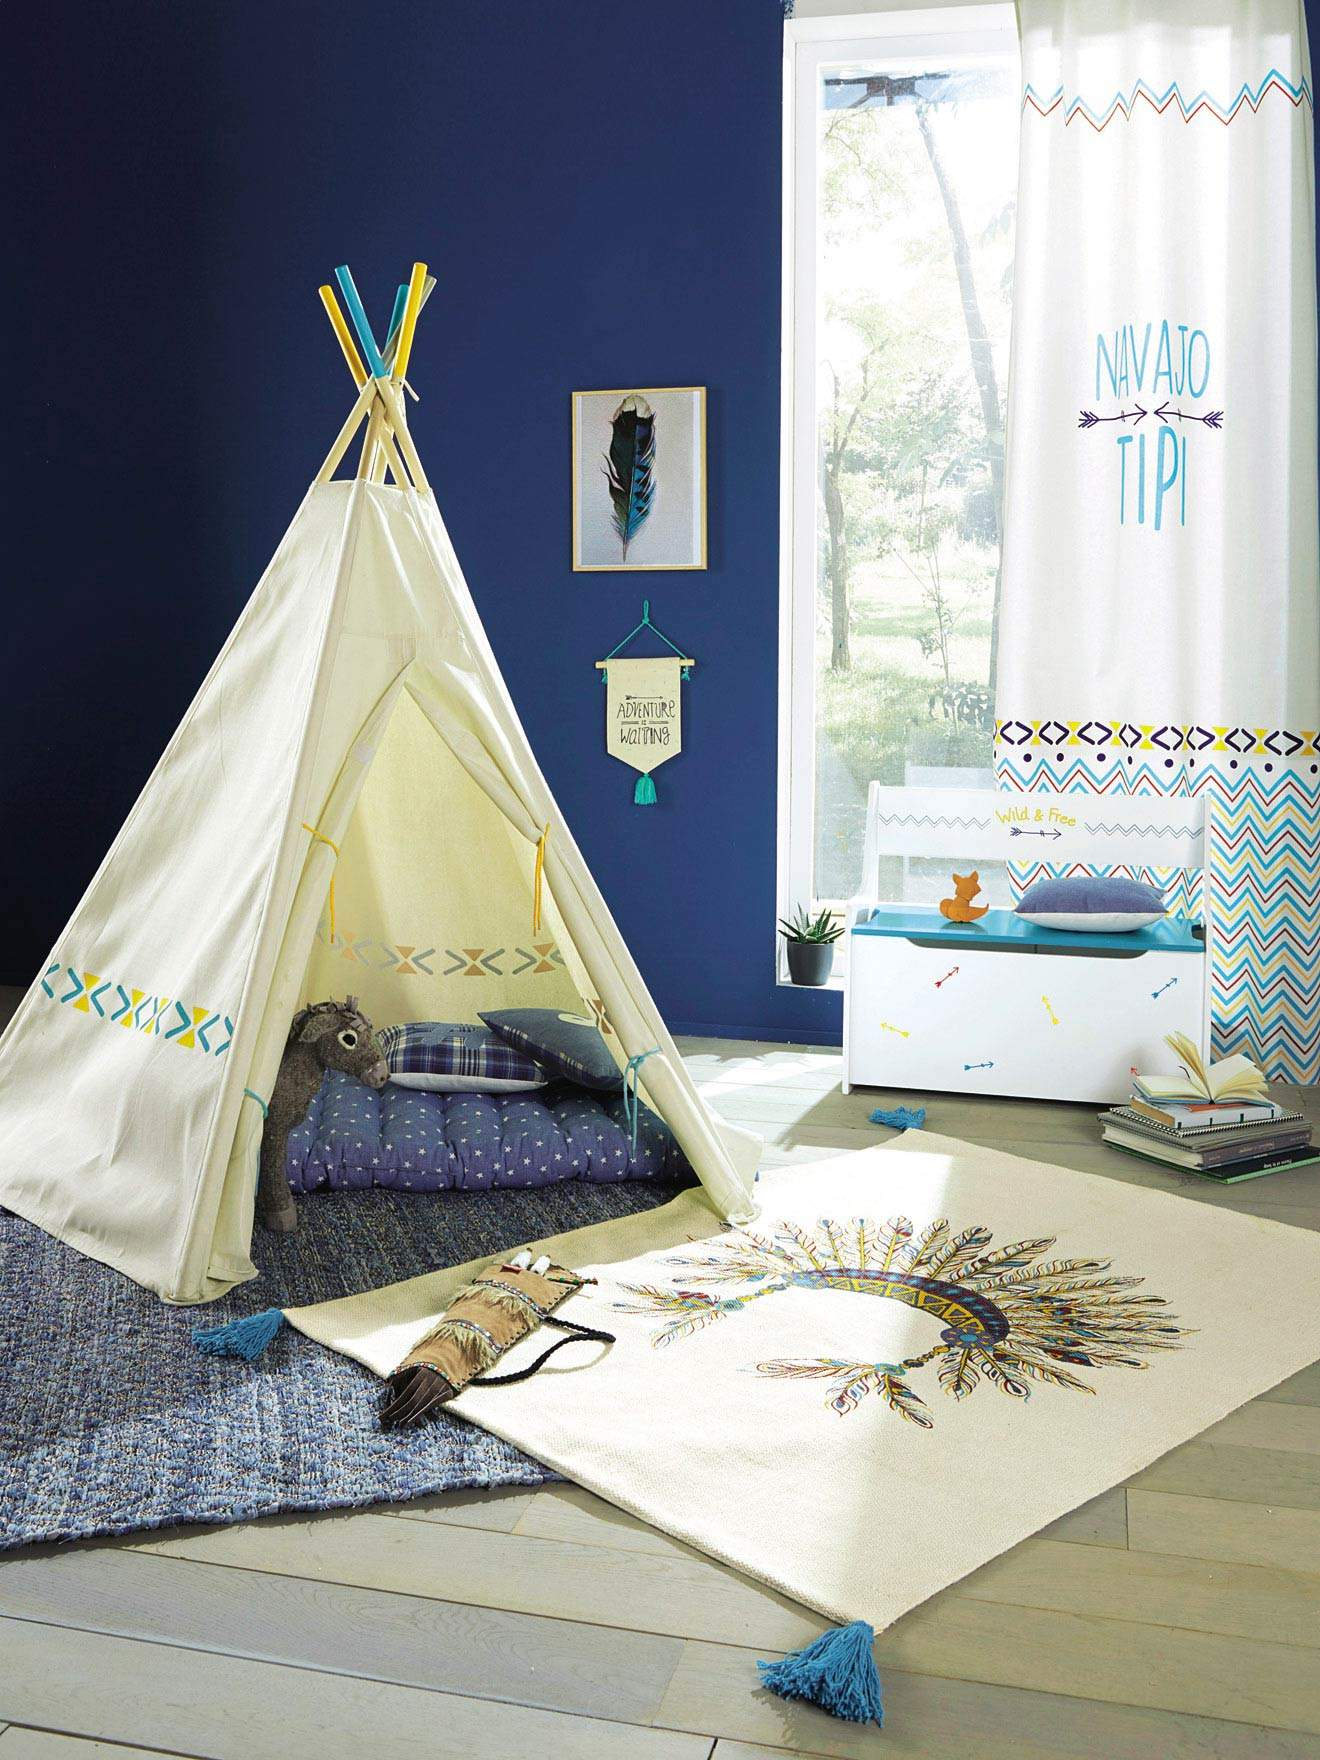 mon prochain diy le tipi enfant inspirations et tutos. Black Bedroom Furniture Sets. Home Design Ideas